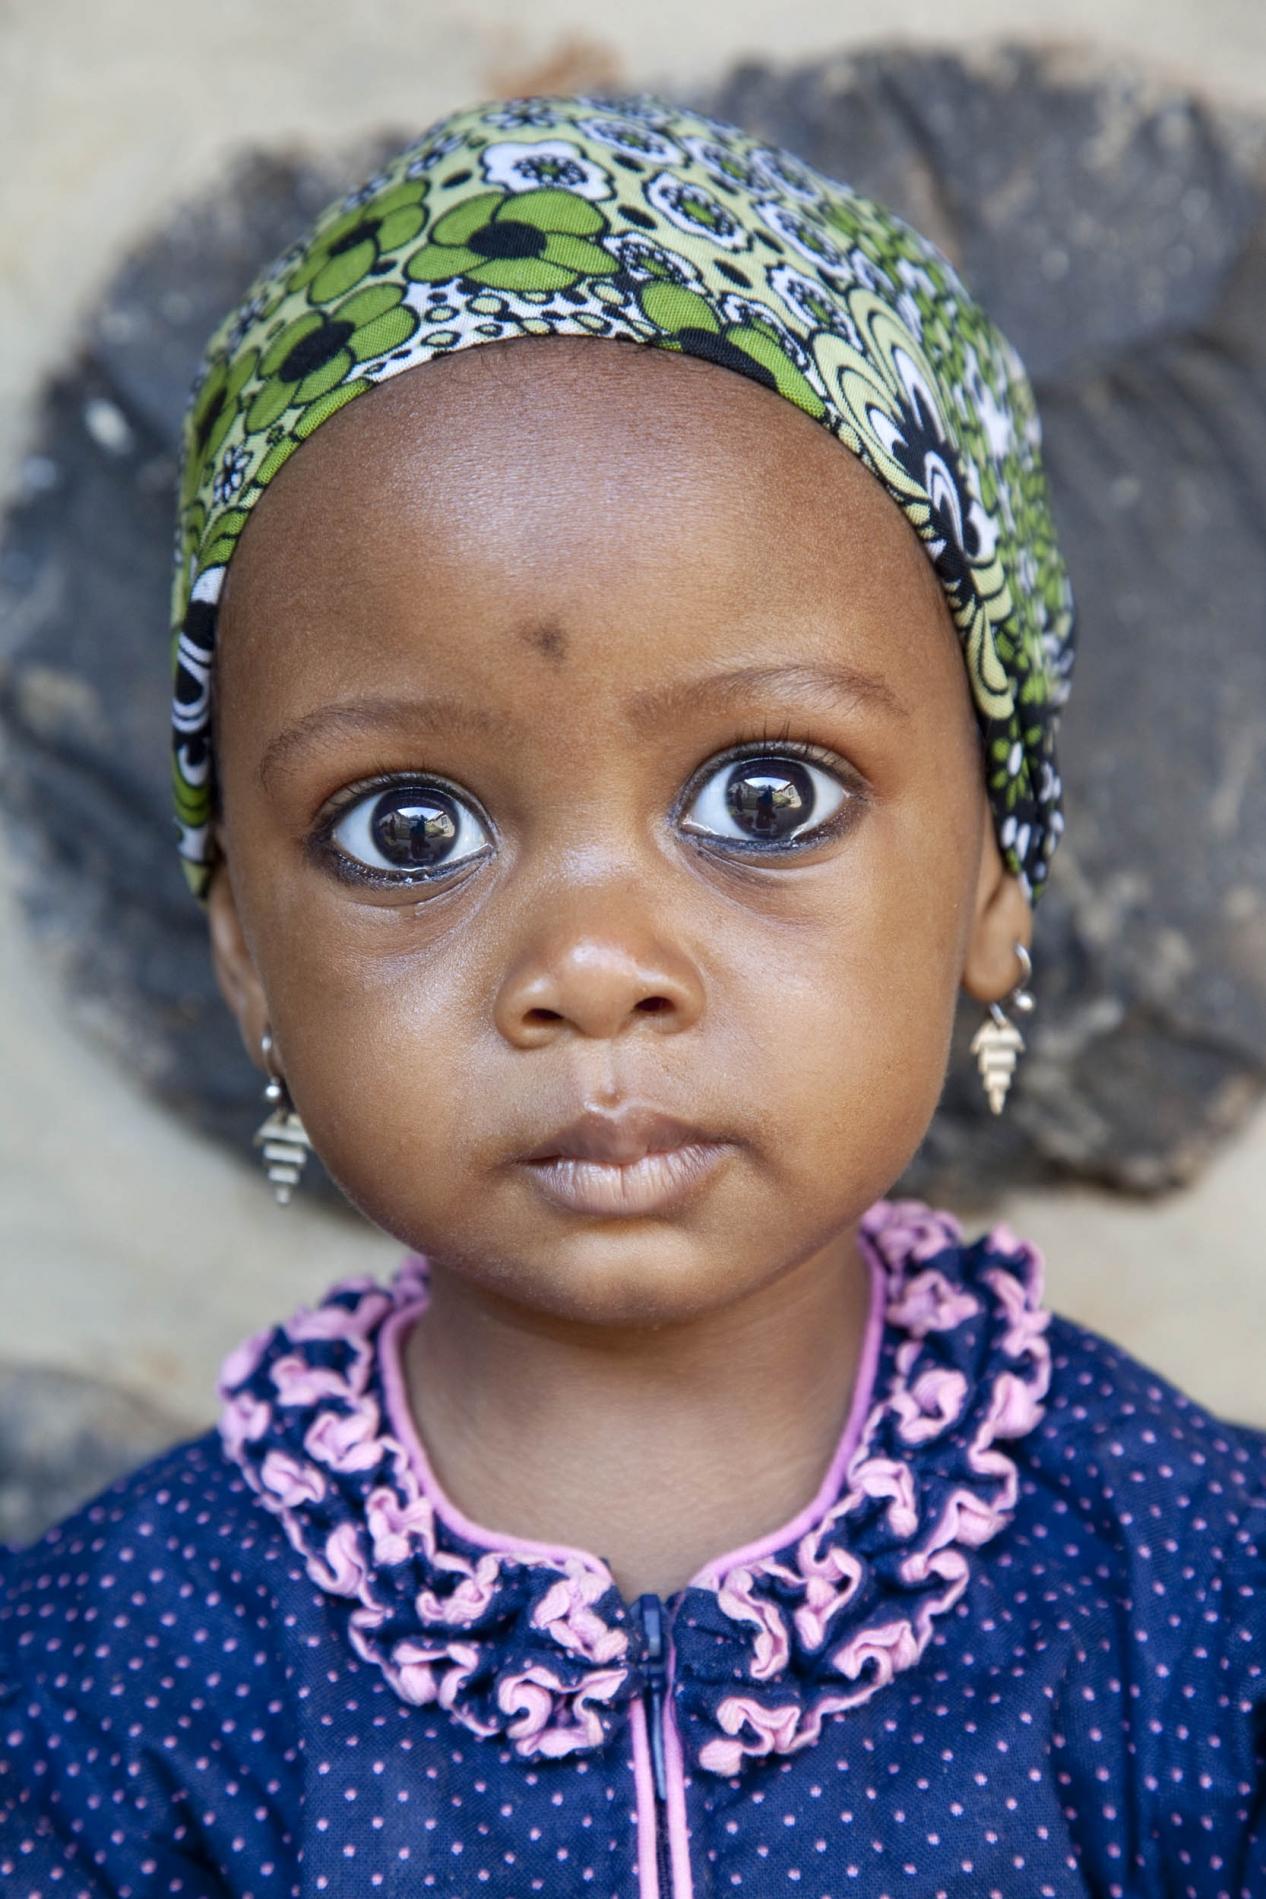 Cameroon12